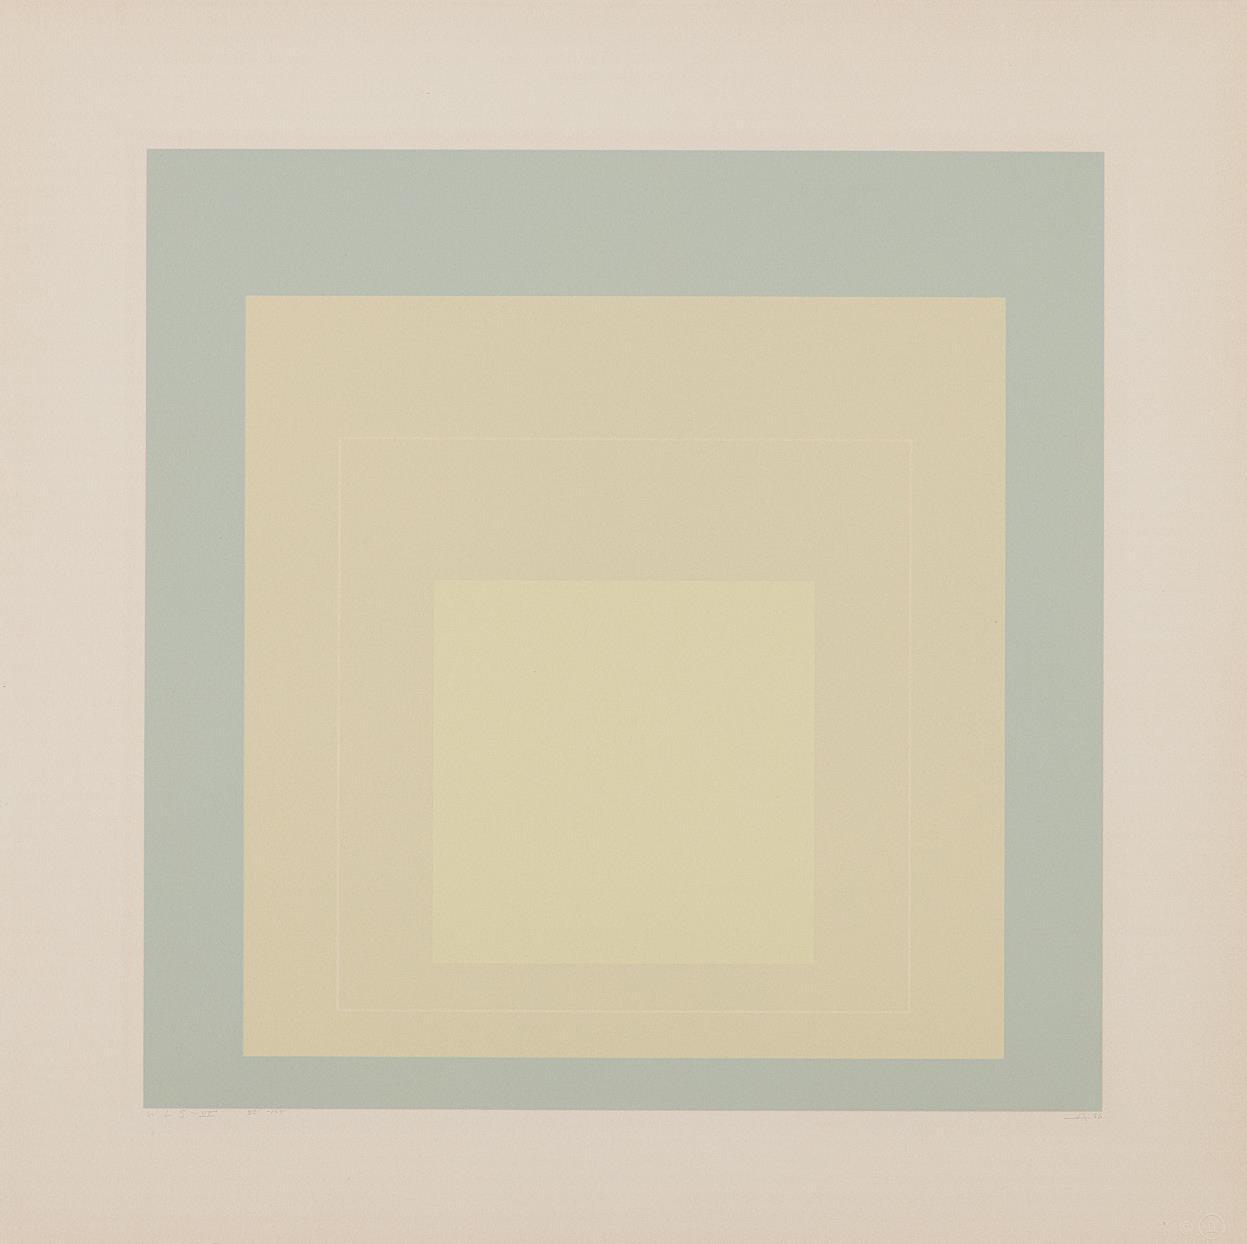 Josef Albers-White Line Squares: White Line Square VII-1966